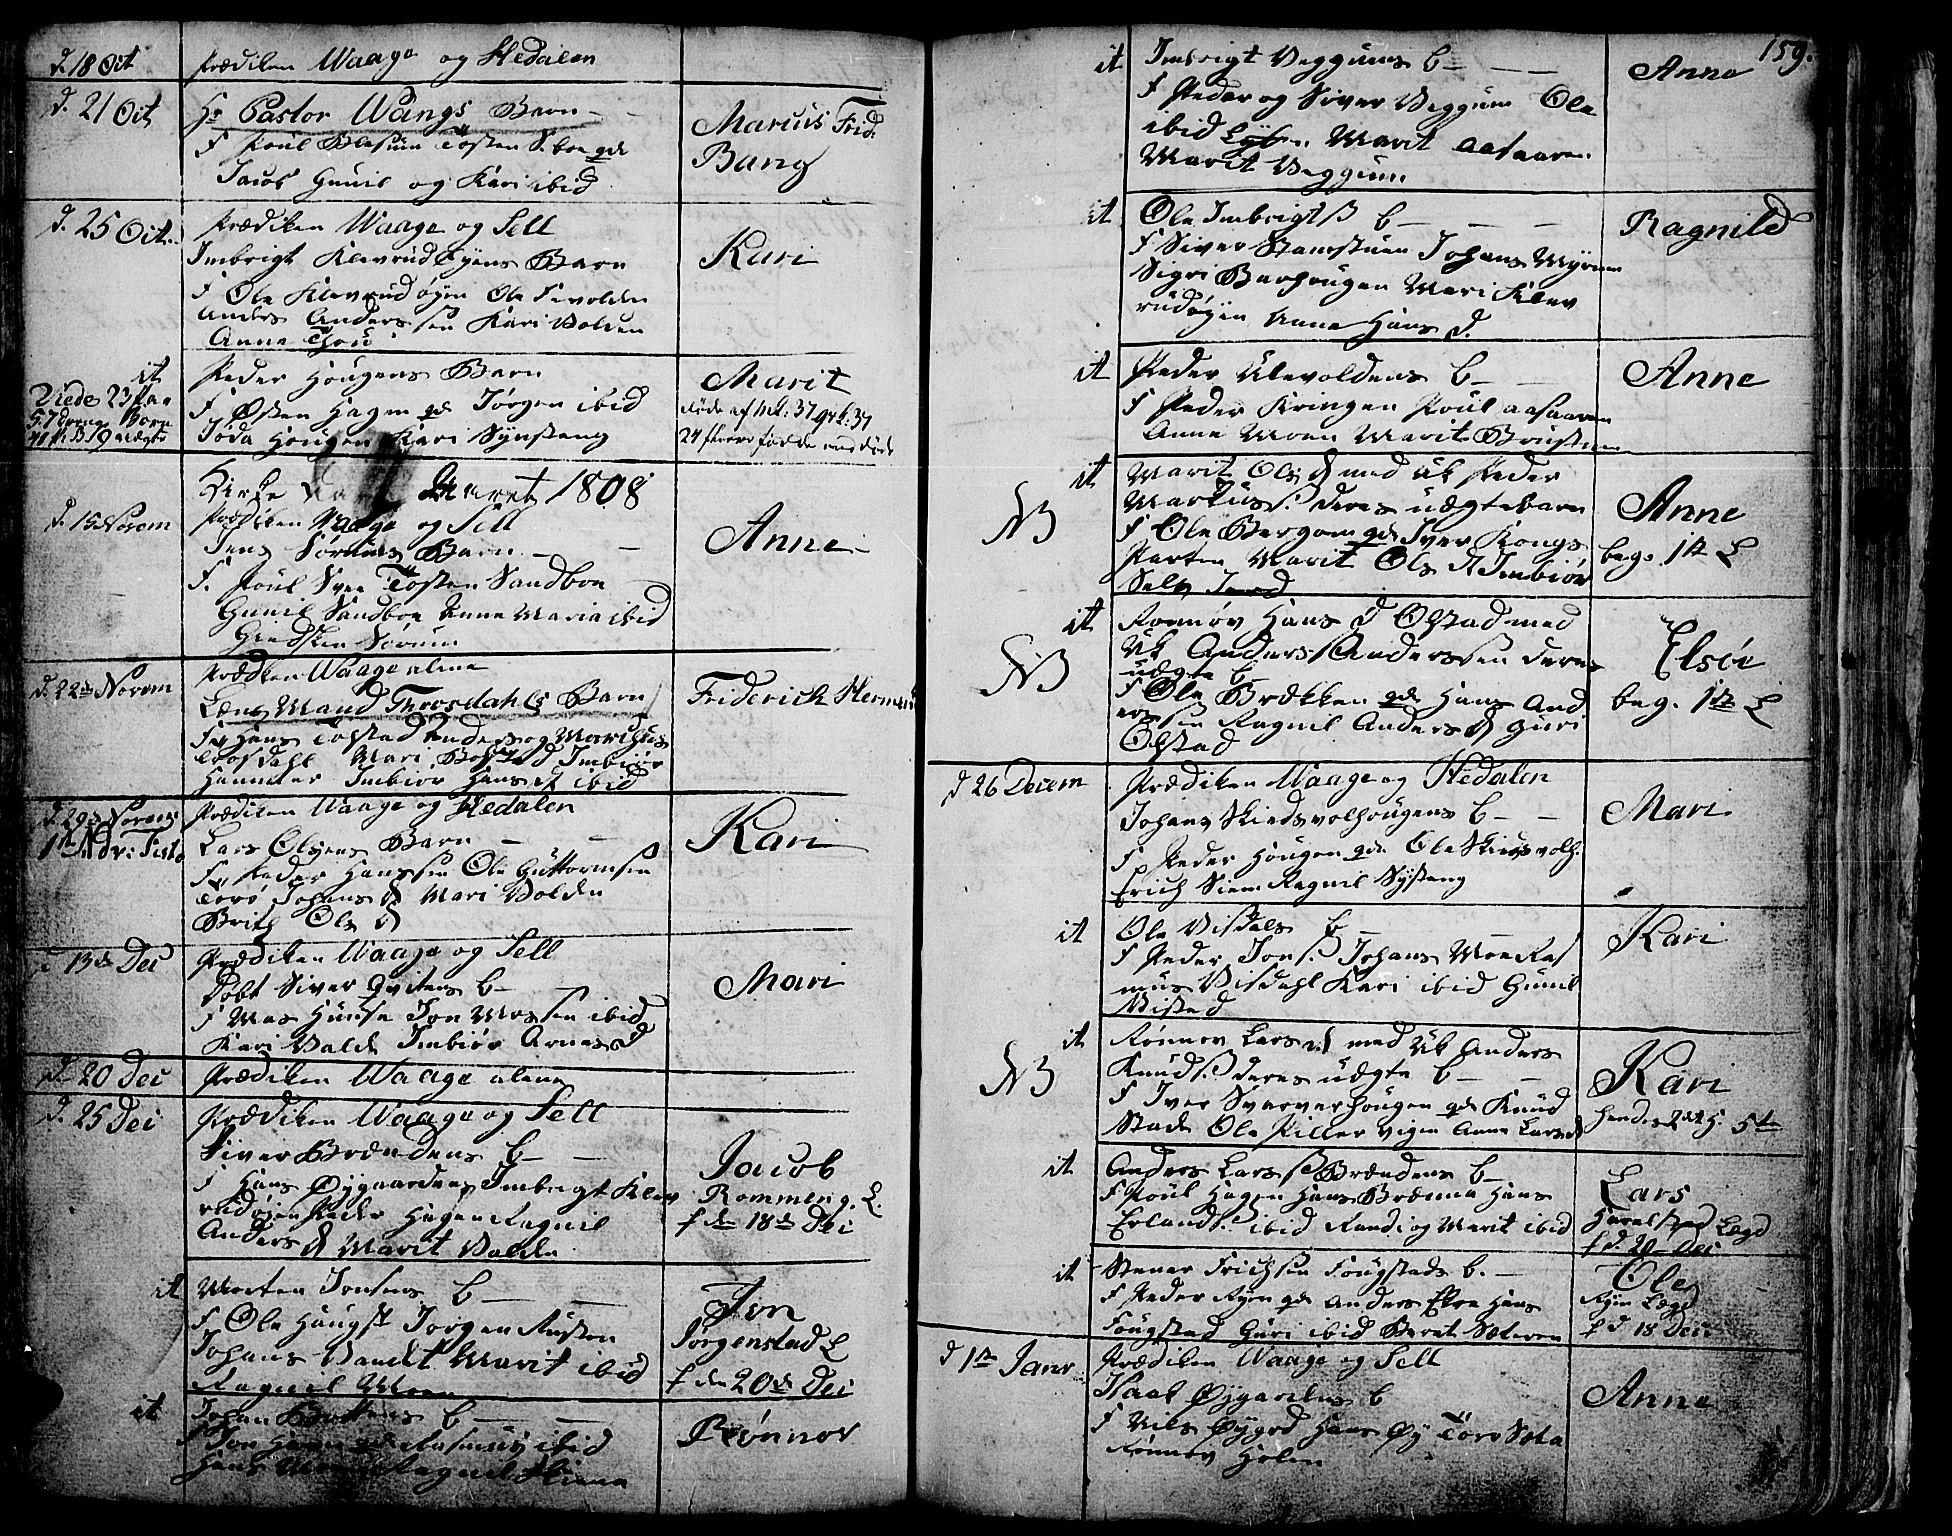 SAH, Vågå prestekontor, Ministerialbok nr. 1, 1739-1810, s. 159